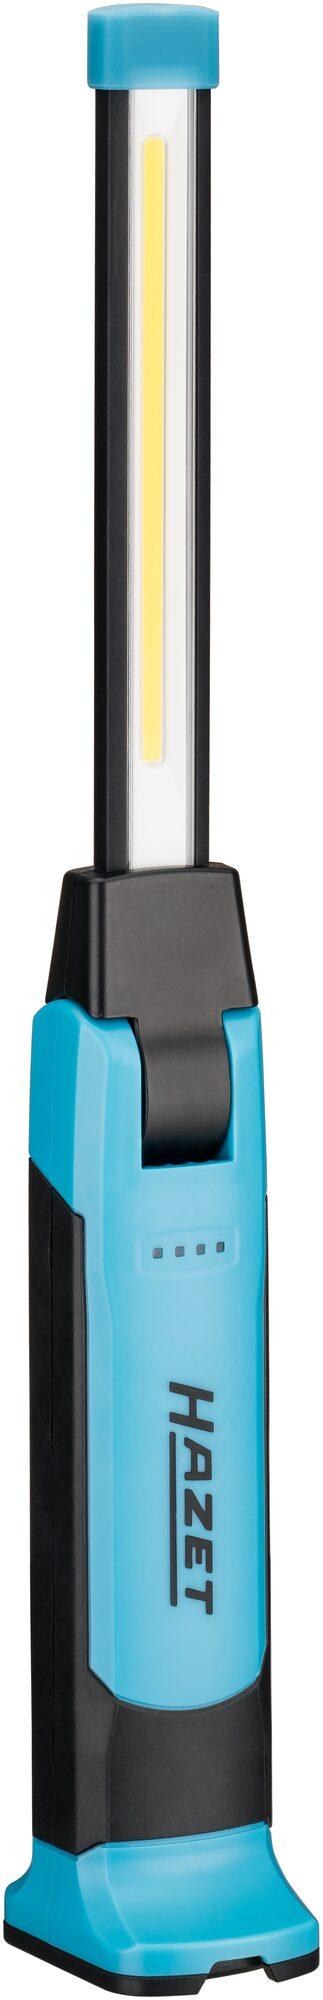 HAZET LED Slim Light ∙ wireless charging 1979W-92